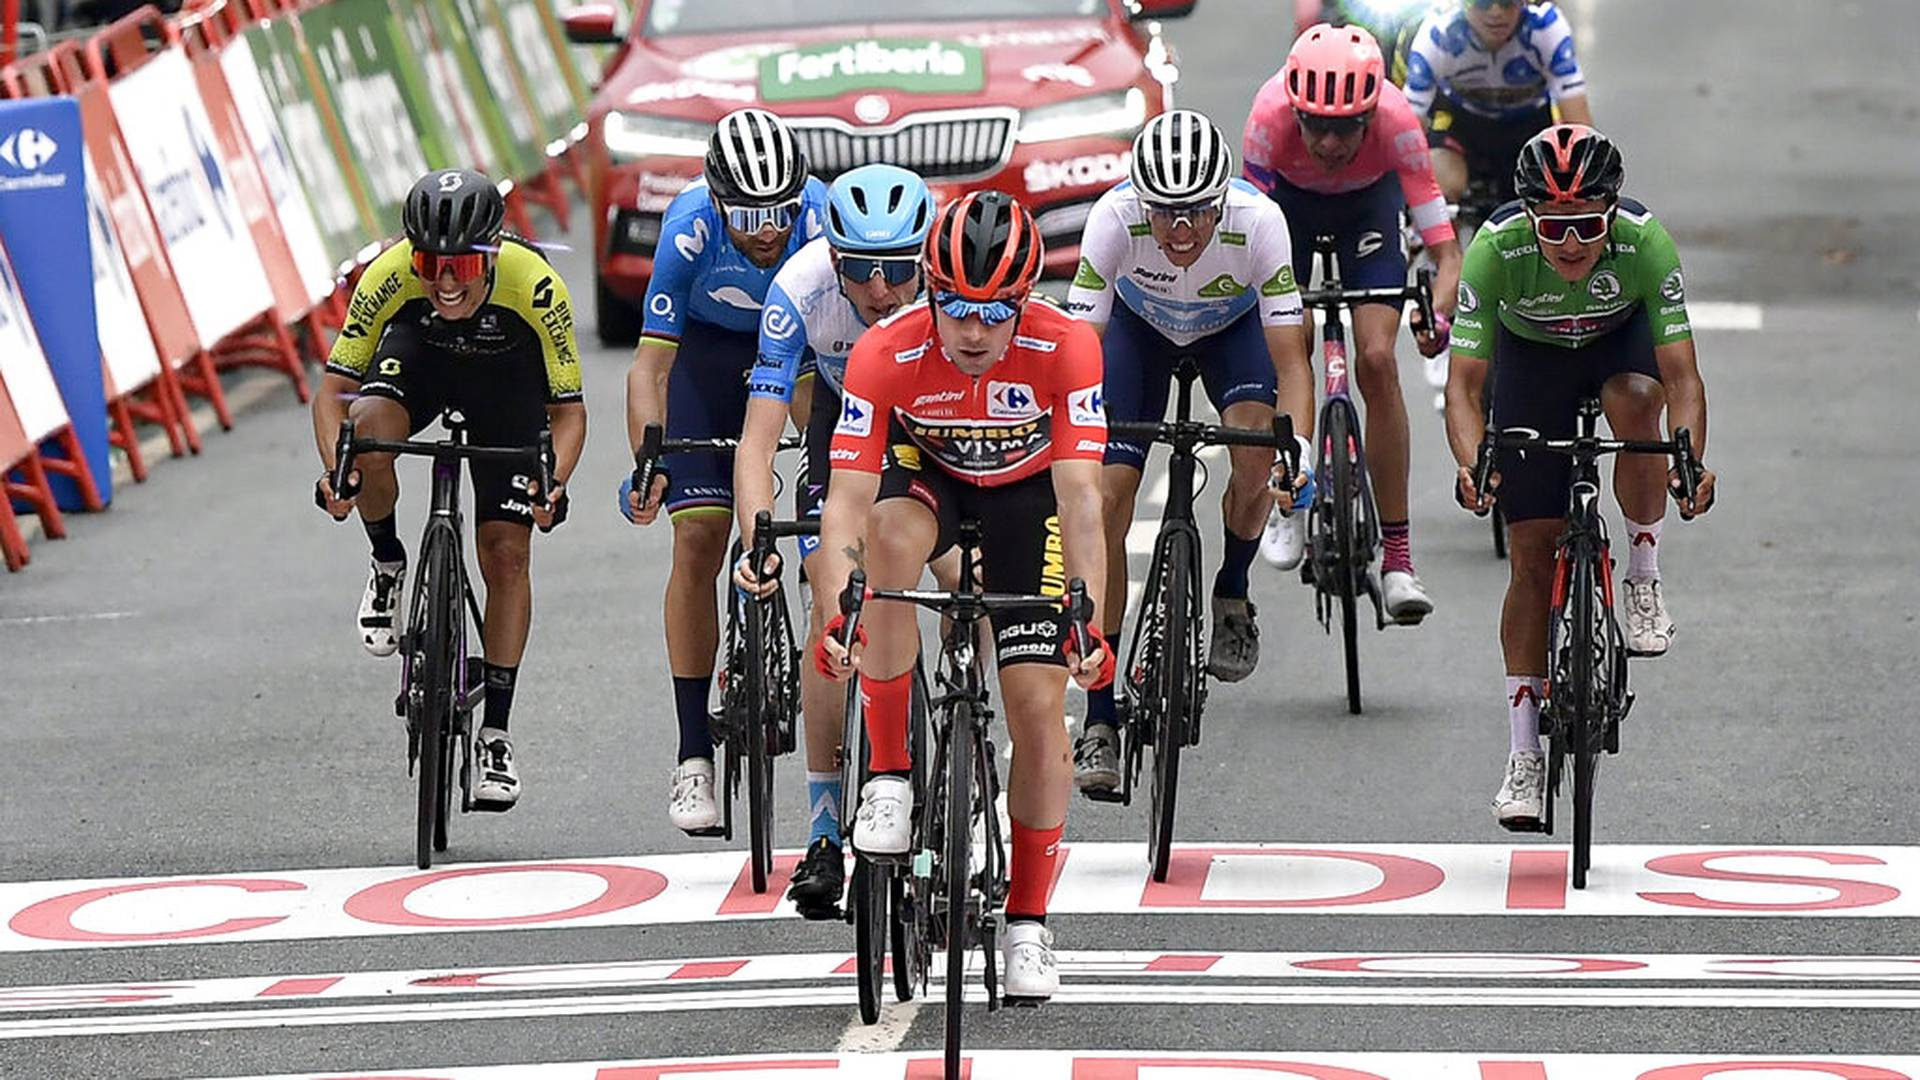 Jumbo-Visma's Primoz Roglic, crosses the line in second position at the end of the second stage of La Vuelta between Pamplona and Lekunberri, in Lekunberri, northern Spain, Wednesday, Oct. 21, 2020. (AP Photo/Alvaro Barrientos)